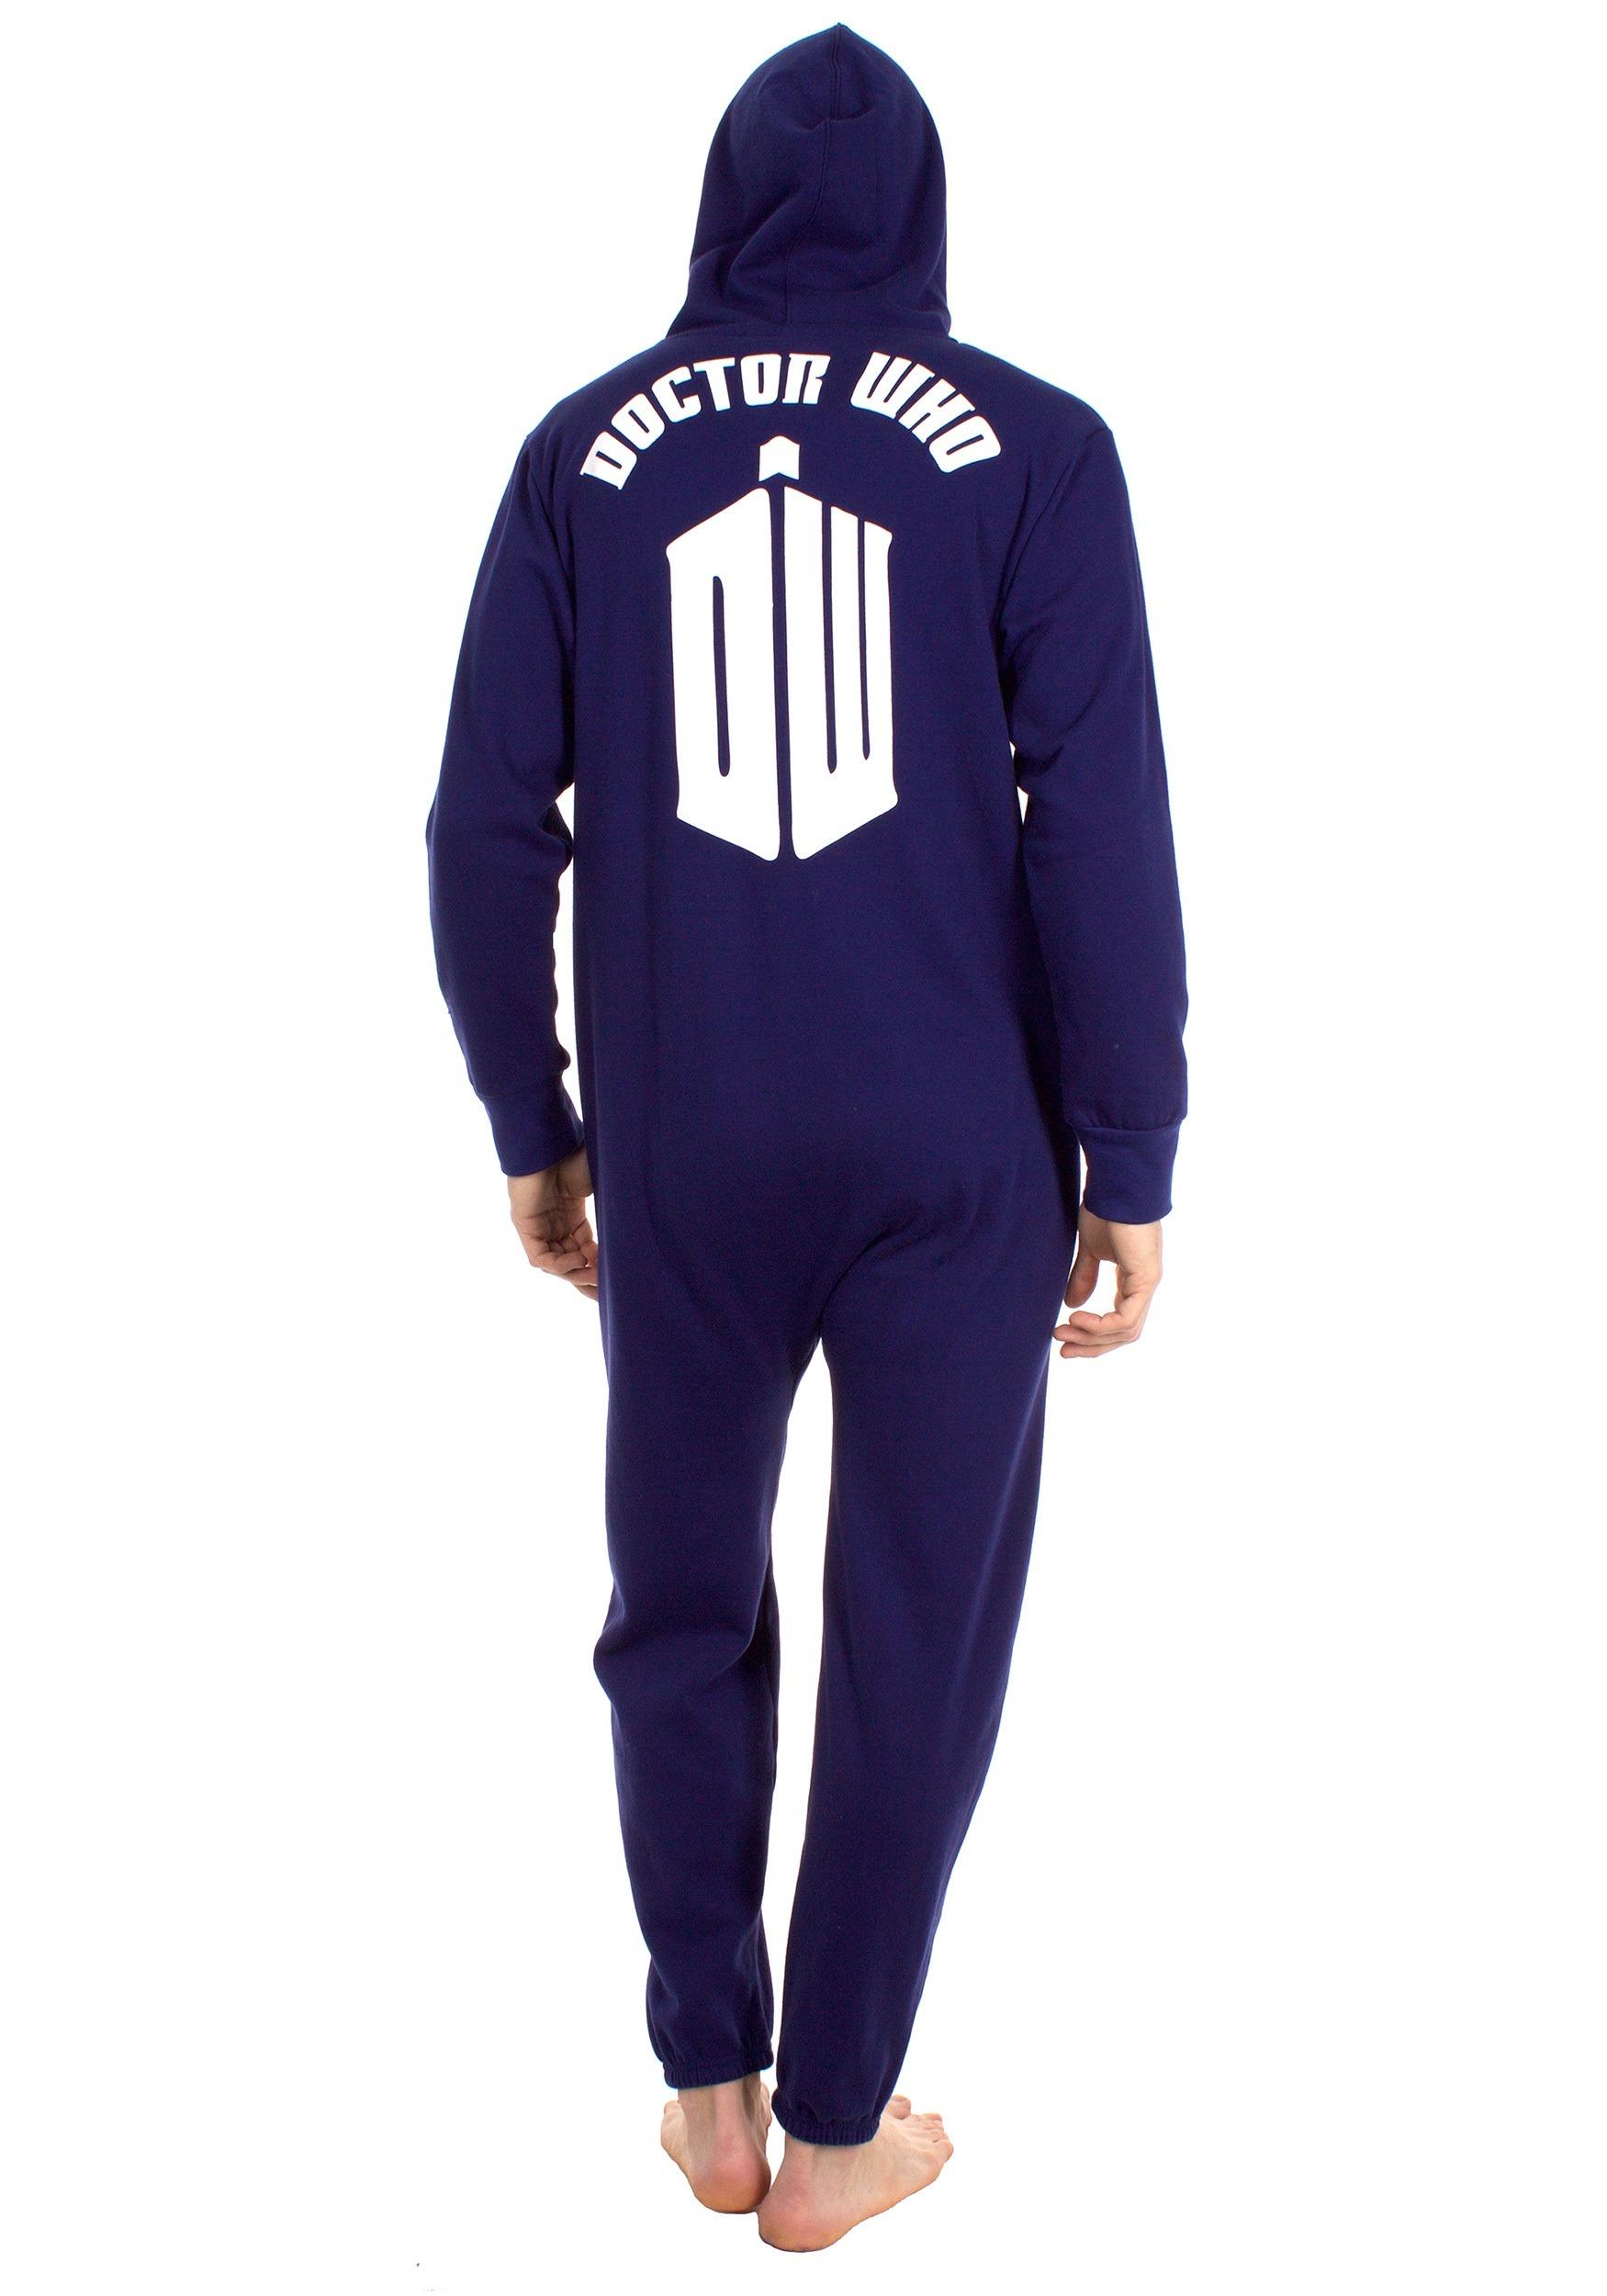 7b44e216e85f Doctor Who TARDIS Onesie Pajama Costume